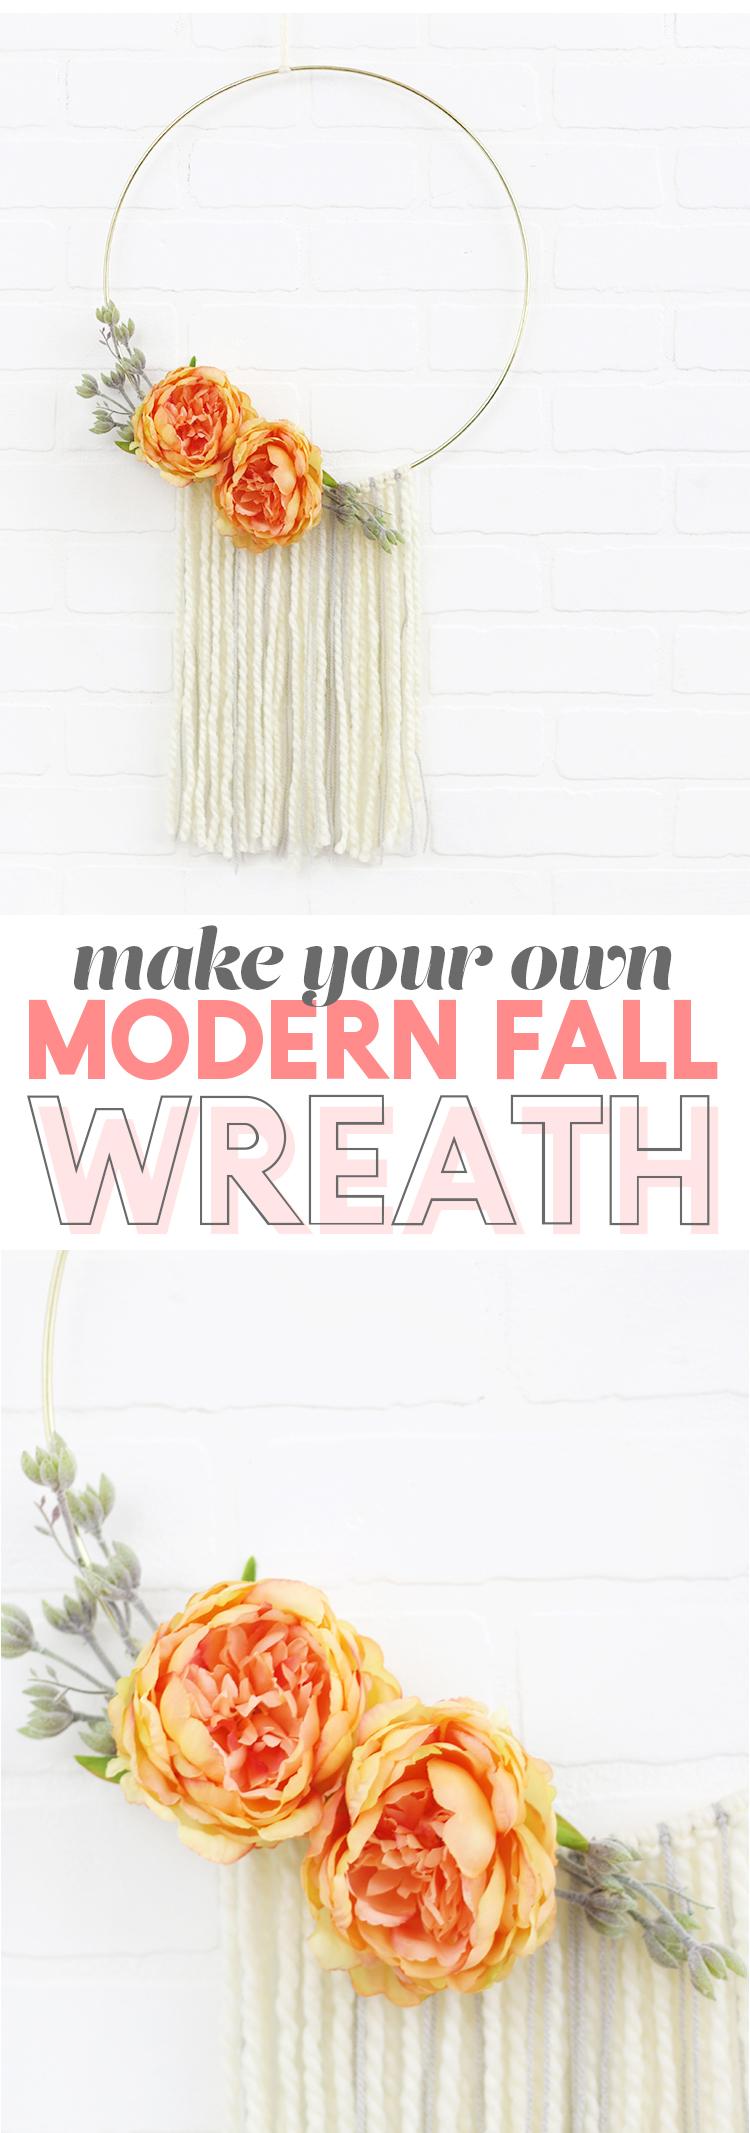 diy modern fall wreath - simple hoop wreath with yarn and flowers